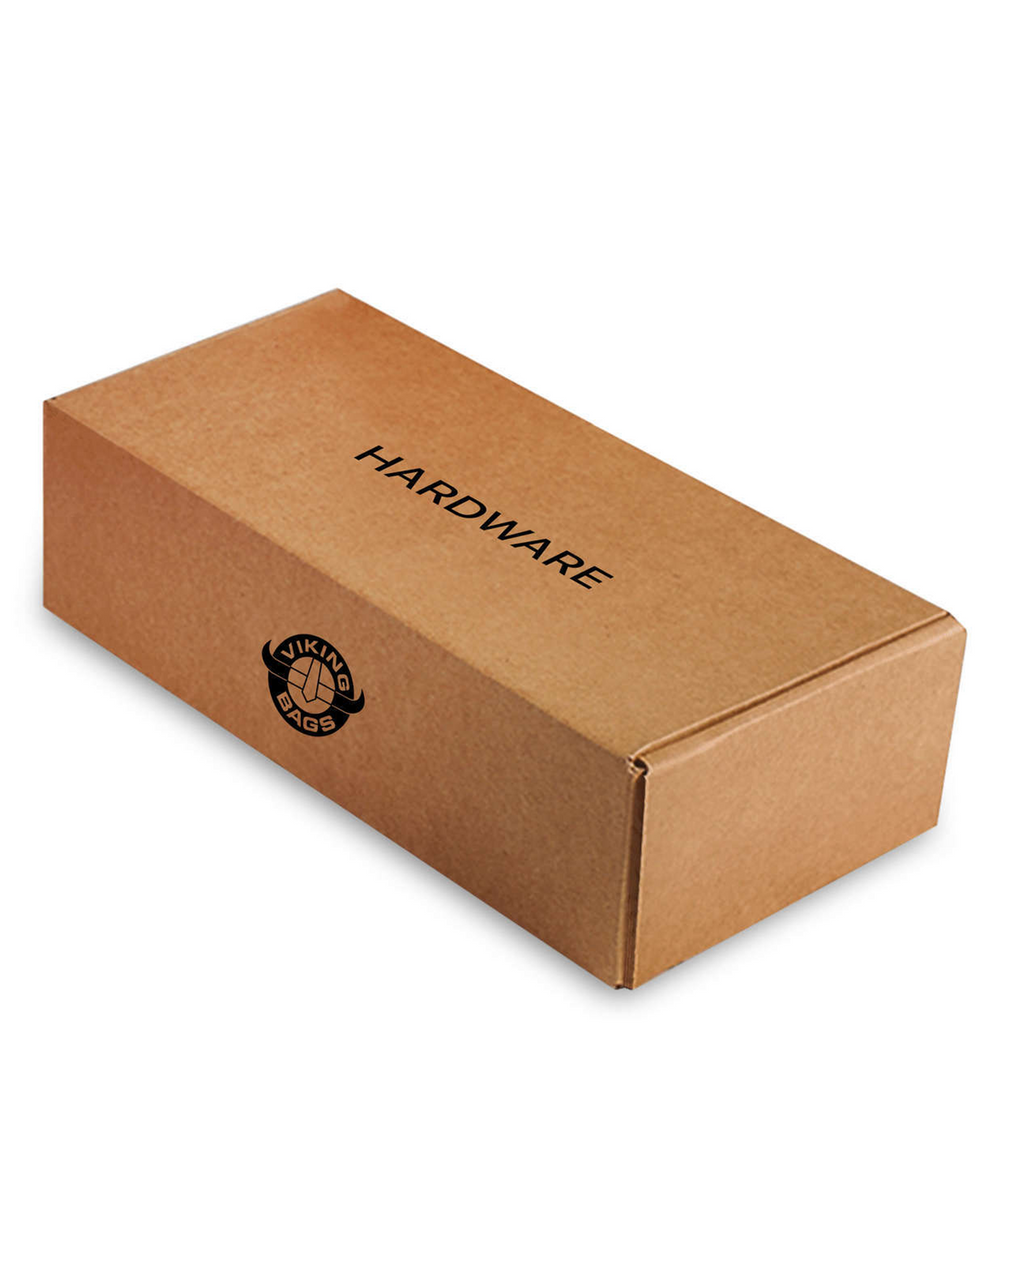 Viking Charger Single Strap Medium Motorcycle Saddlebags For Harley Softail Custom FXSTC Hardware Box